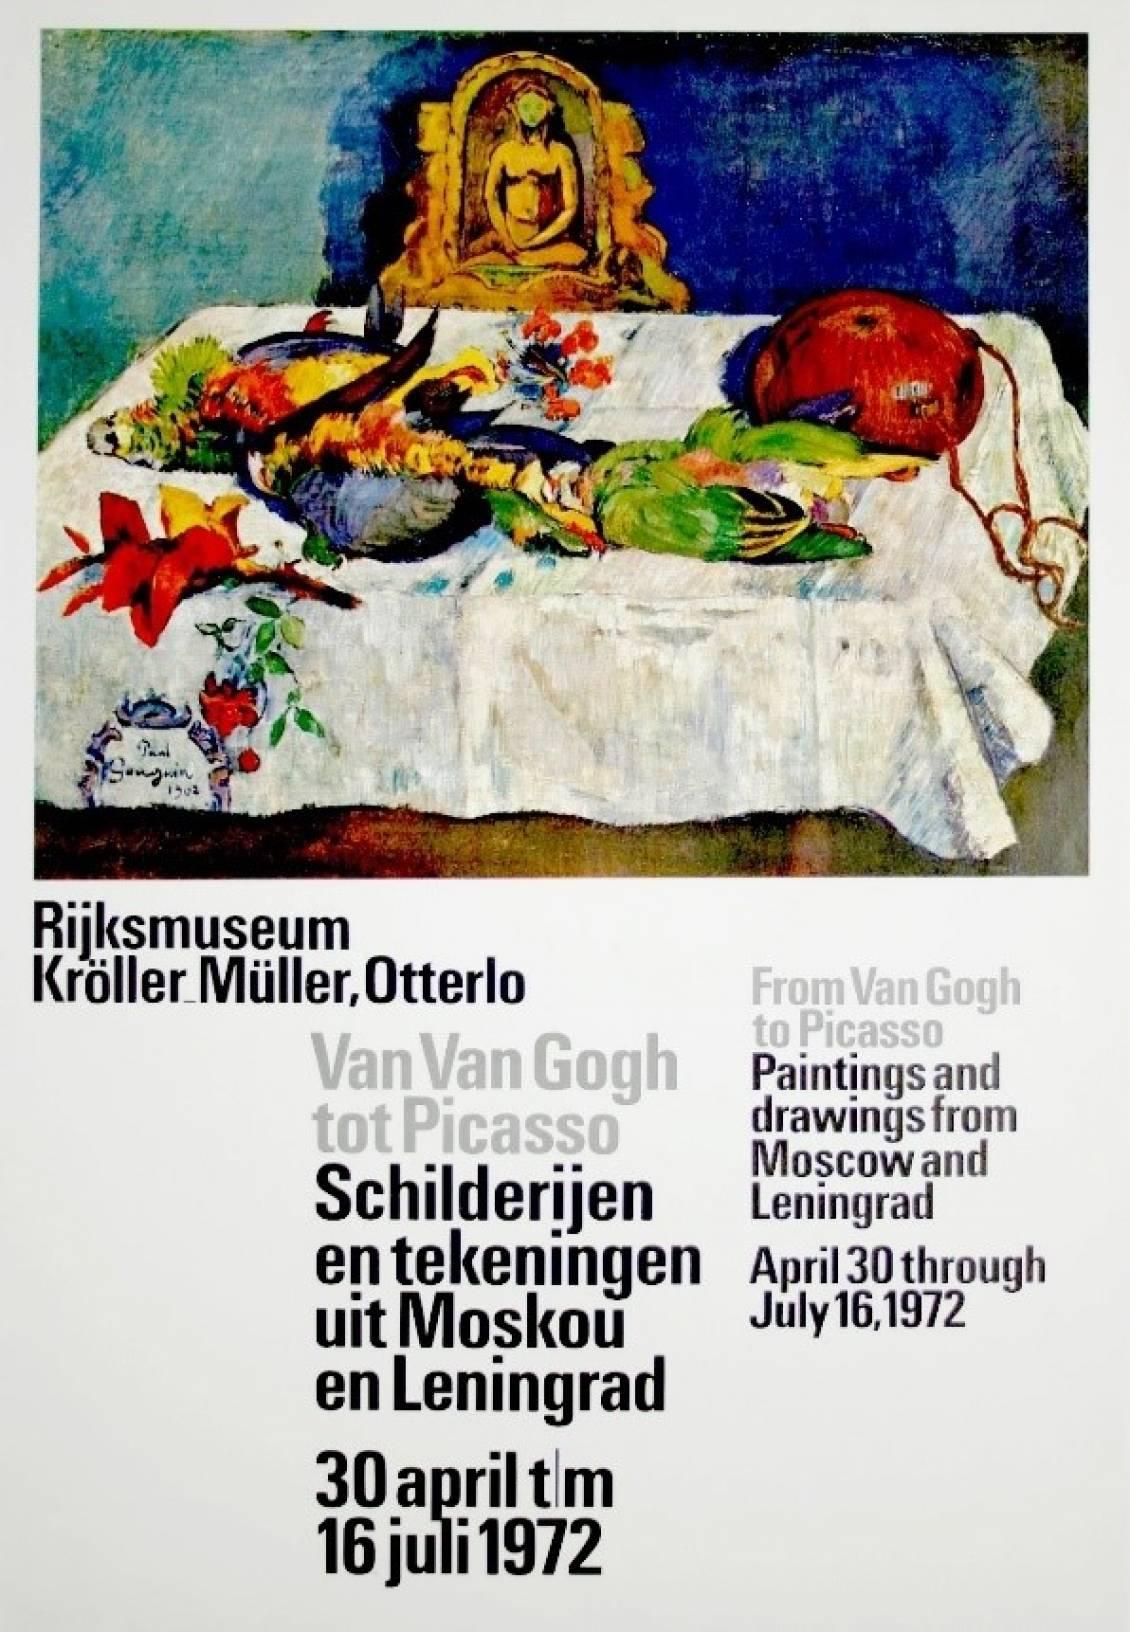 Poster Van Gogh tot Picasso, 1972